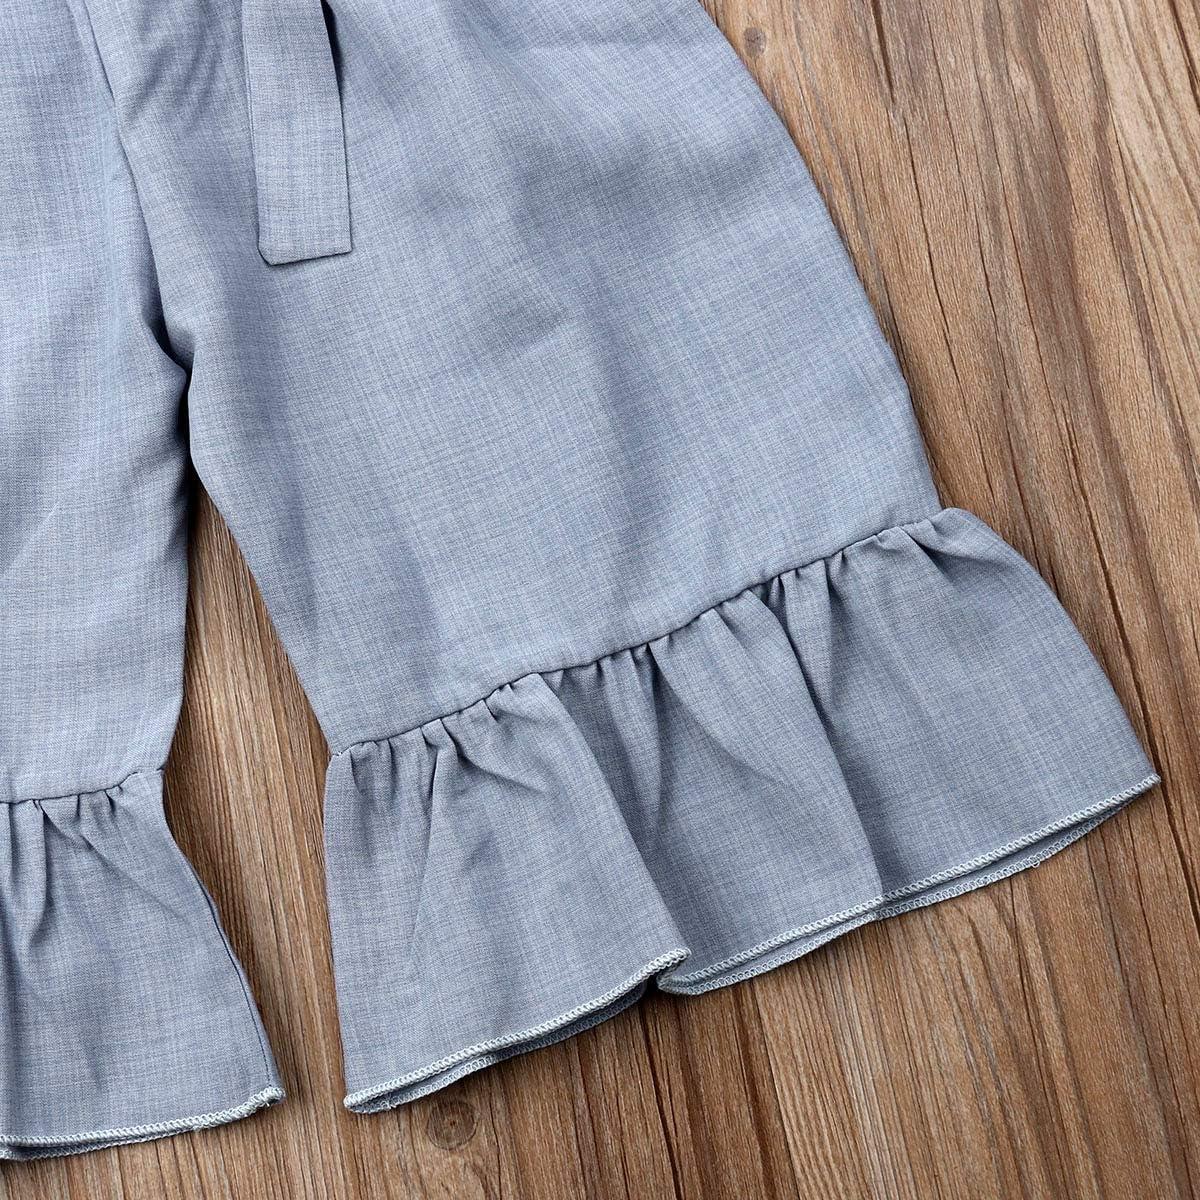 Qiylii Toddler Little Girls Ruffle Sleeveless Sumflower Romper Jumpsuit Bell-Bottom Pants Kids Jumper Clothes